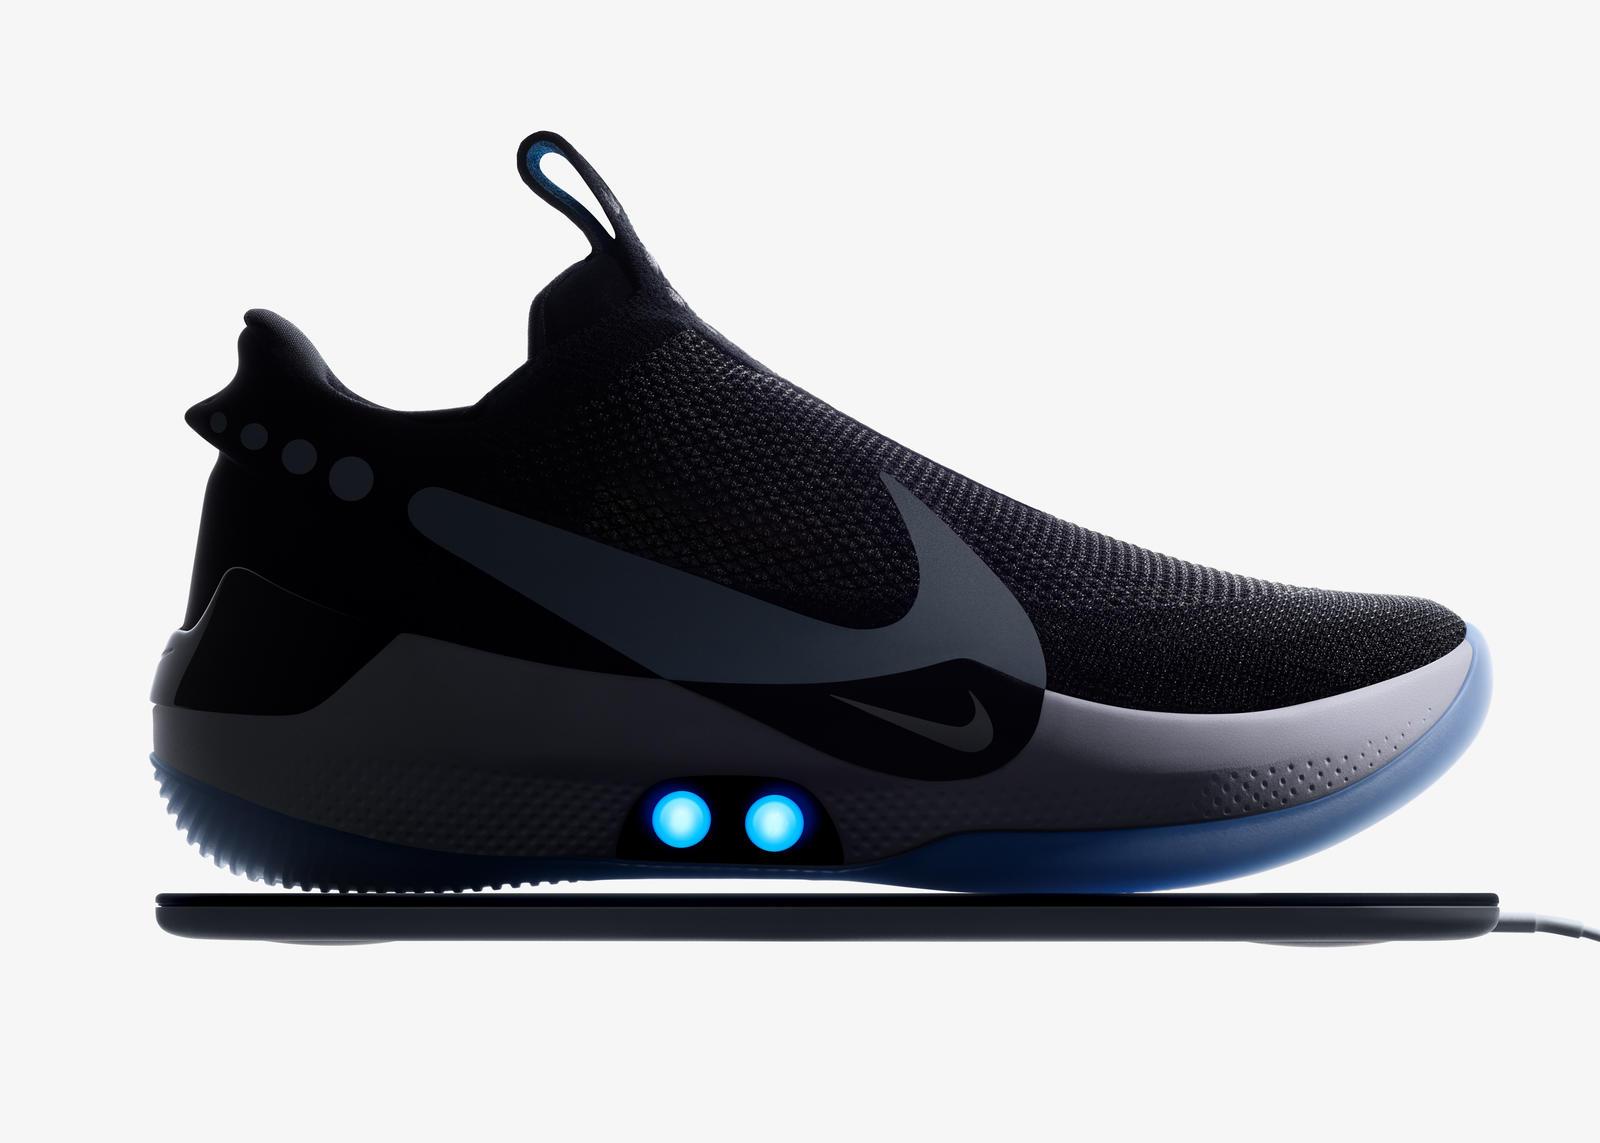 Sp19_BB_Nike_Adapt_20181218_NIKE0538_Detail5_rectangle_1600